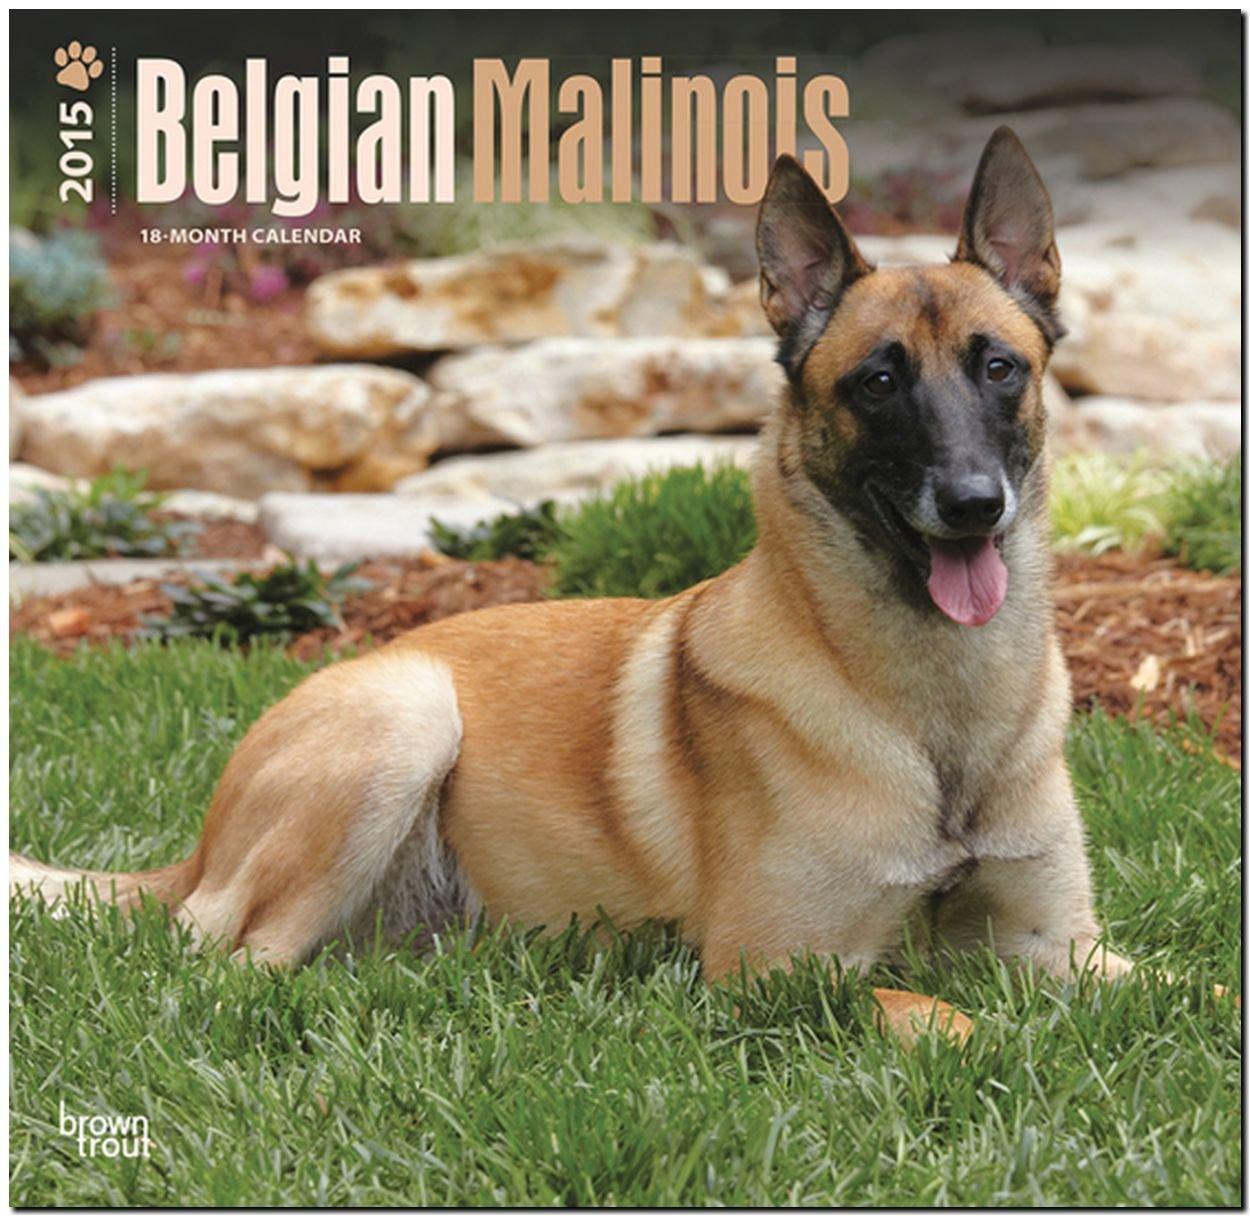 Belgian malinois 2015 square 12x12 browntrout 9781465033819 belgian malinois 2015 square 12x12 browntrout 9781465033819 amazon books nvjuhfo Gallery